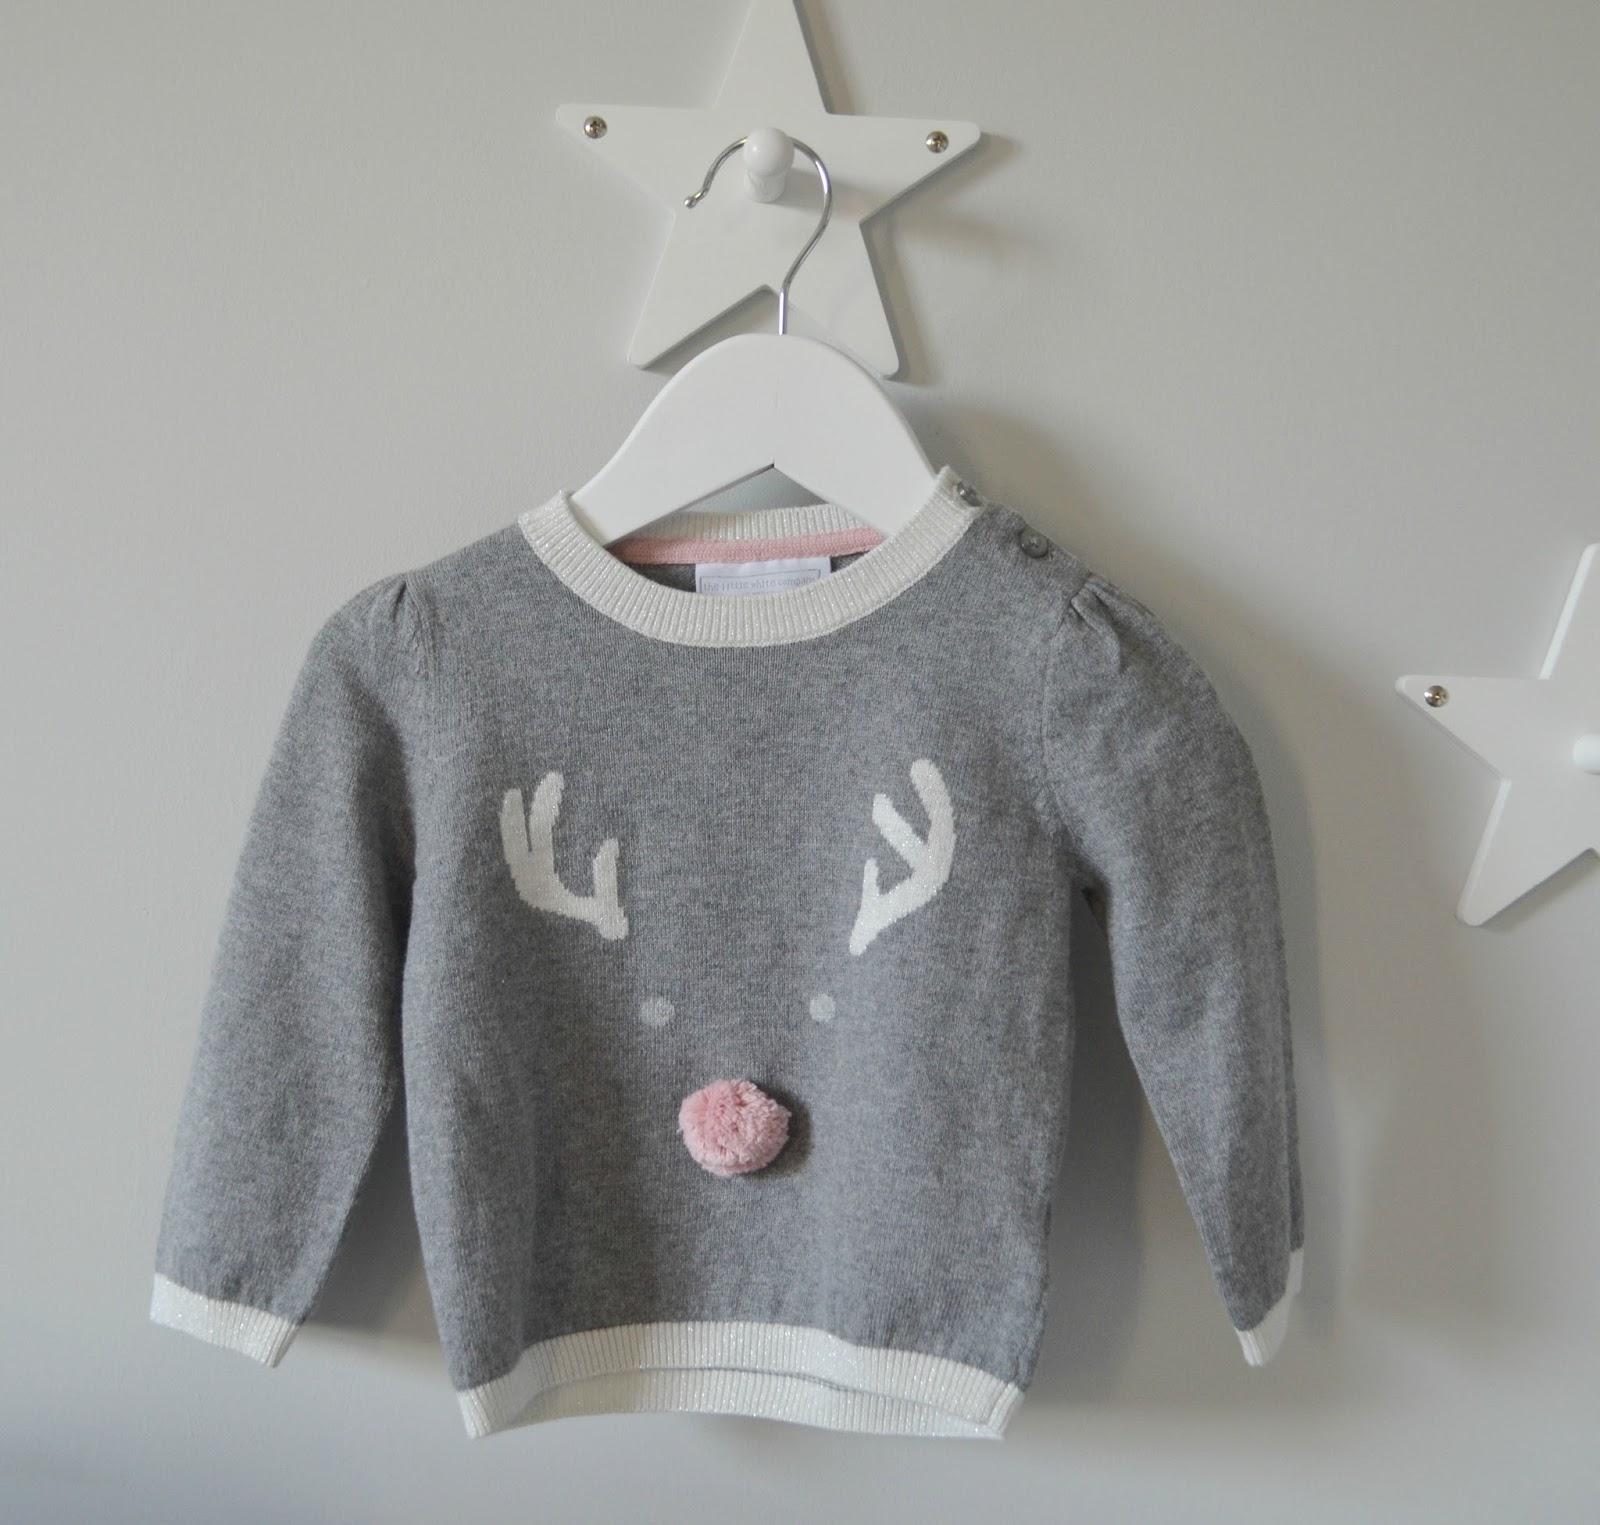 4b92b0699 Baby Christmas Jumpers